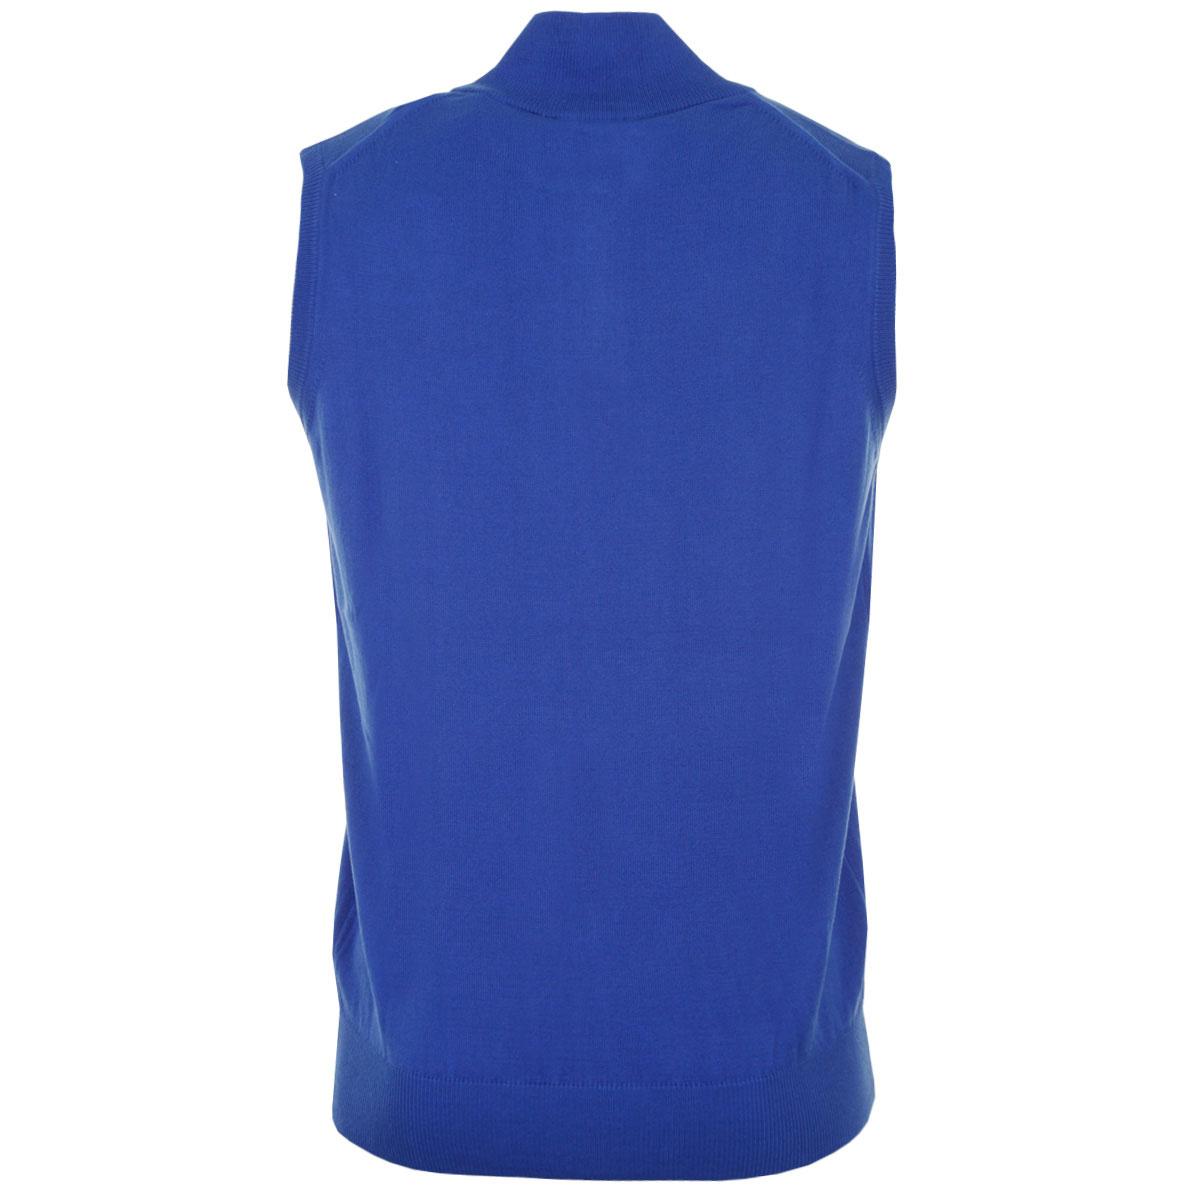 Calvin-Klein-Golf-Mens-CK-1-4-Zip-Sleeveless-Sweater-Vest-Gilet-27-OFF-RRP thumbnail 25